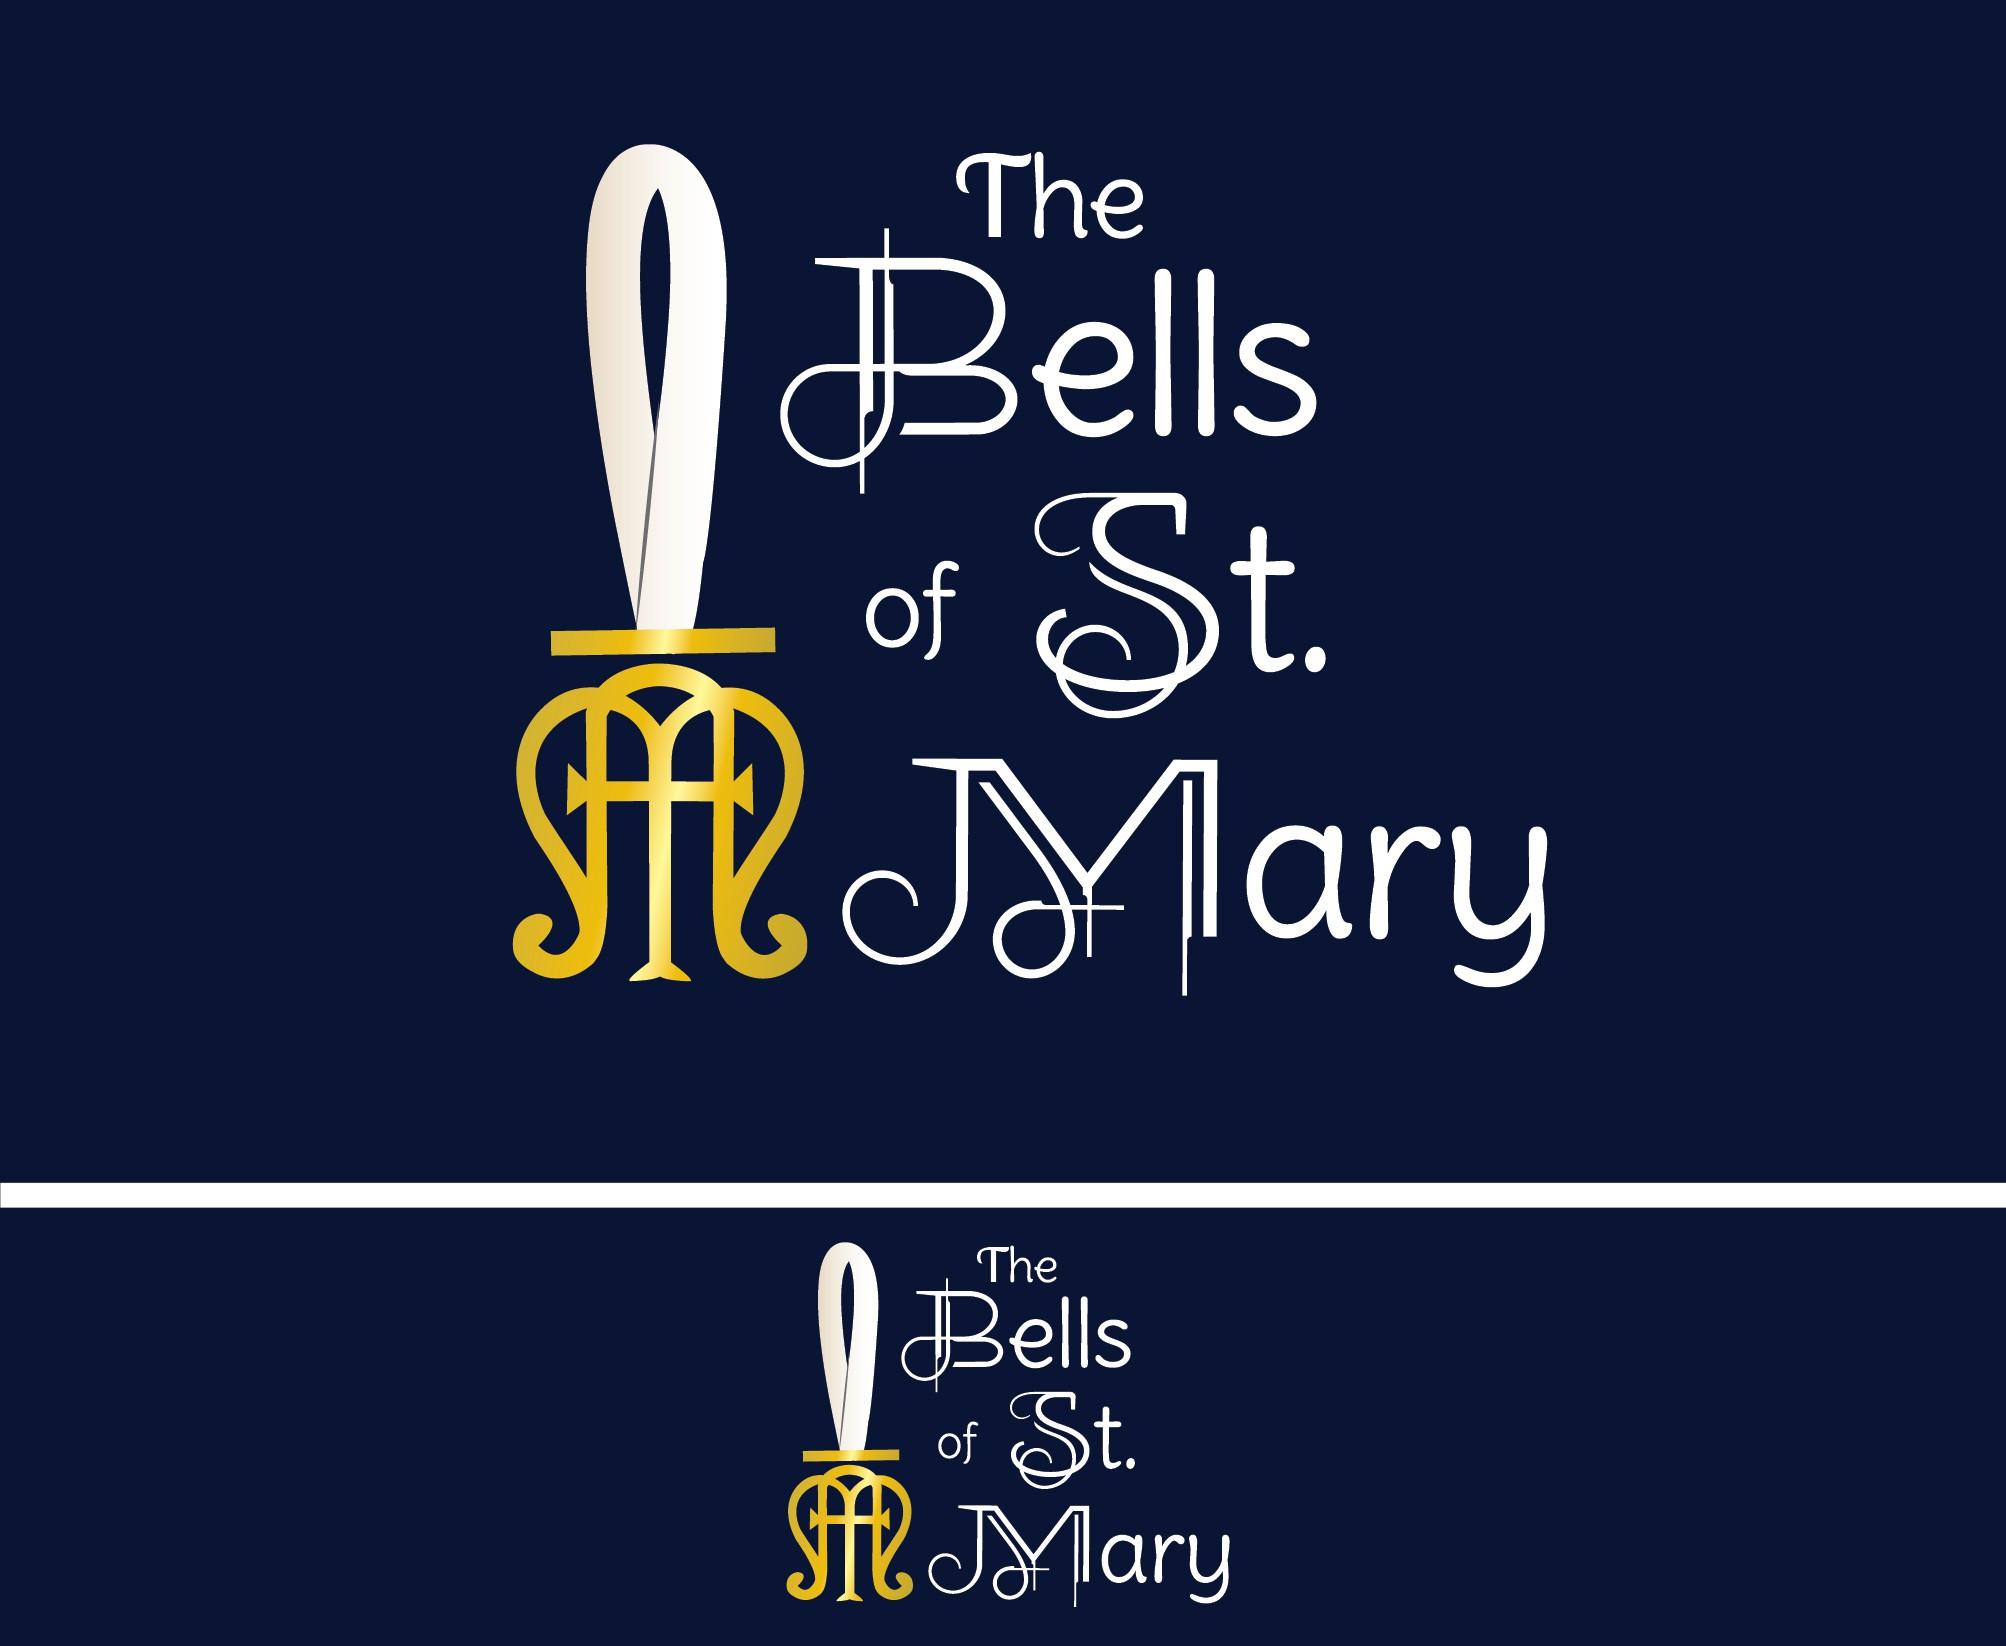 Create a new logo for The Bells of St. Mary, an English handbell choir